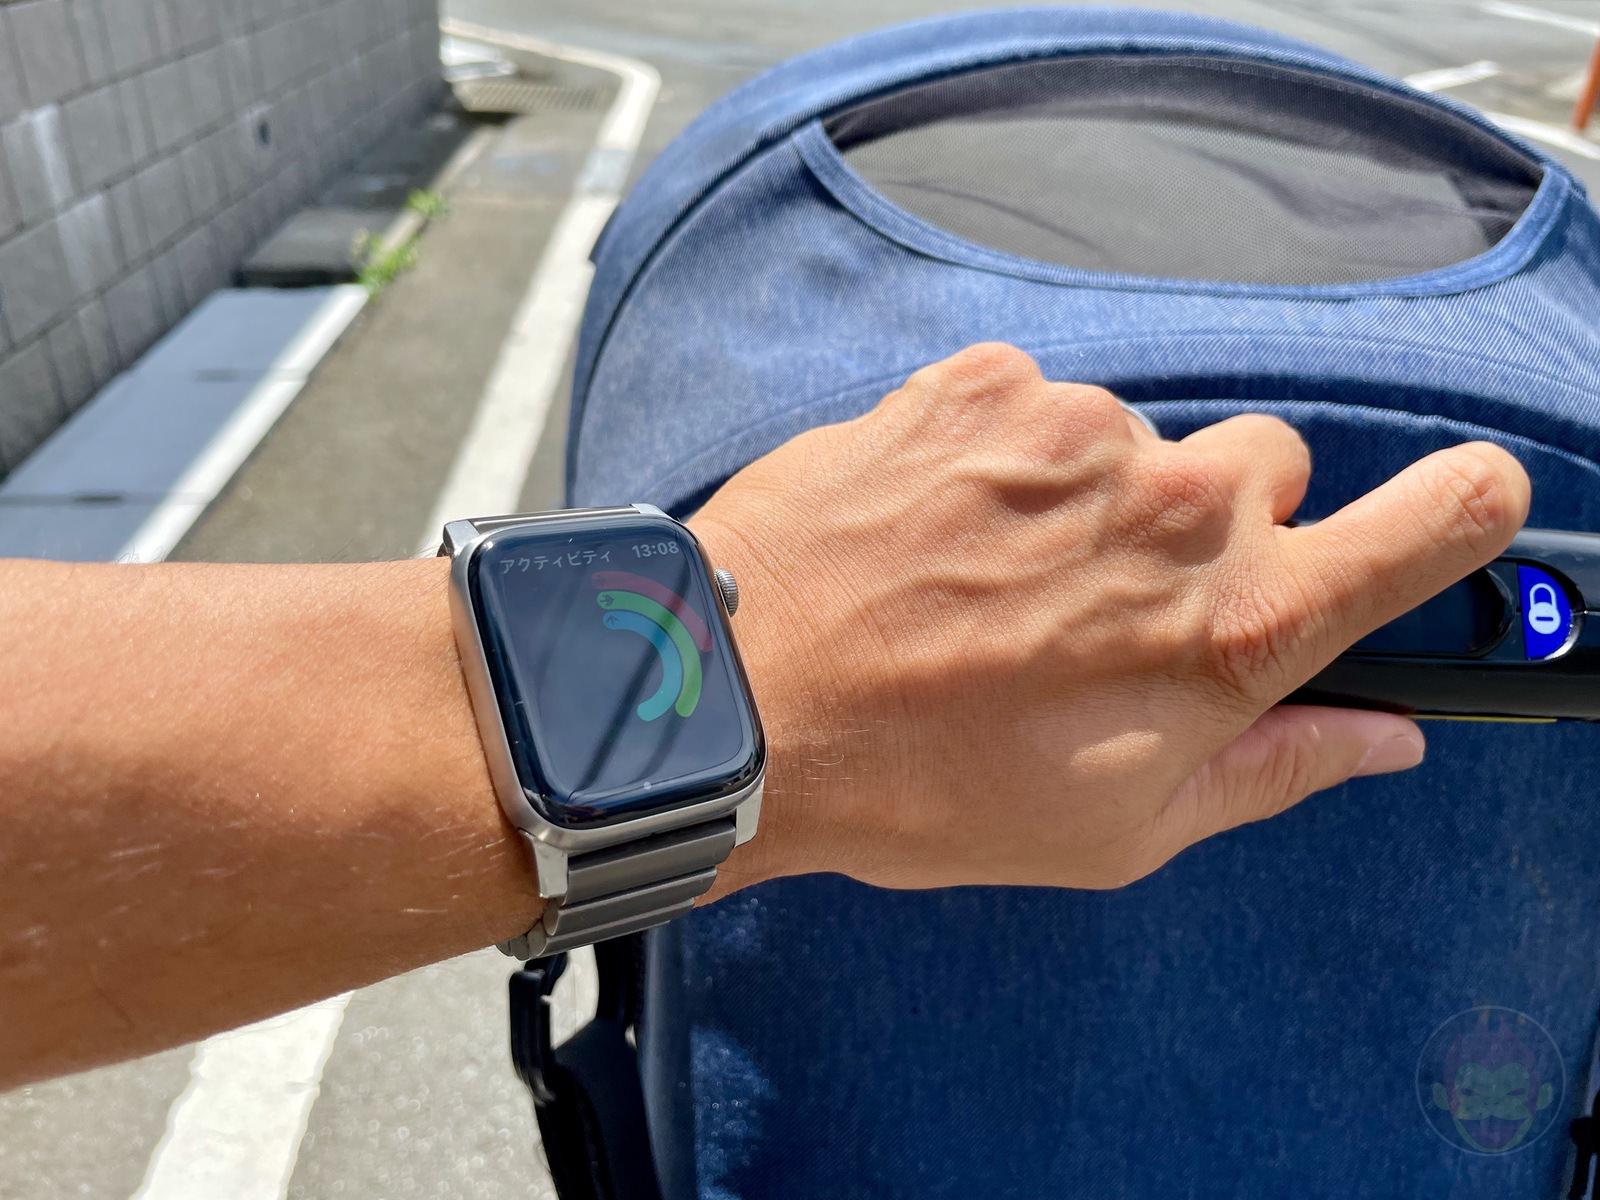 How I use my Apple Watch 01